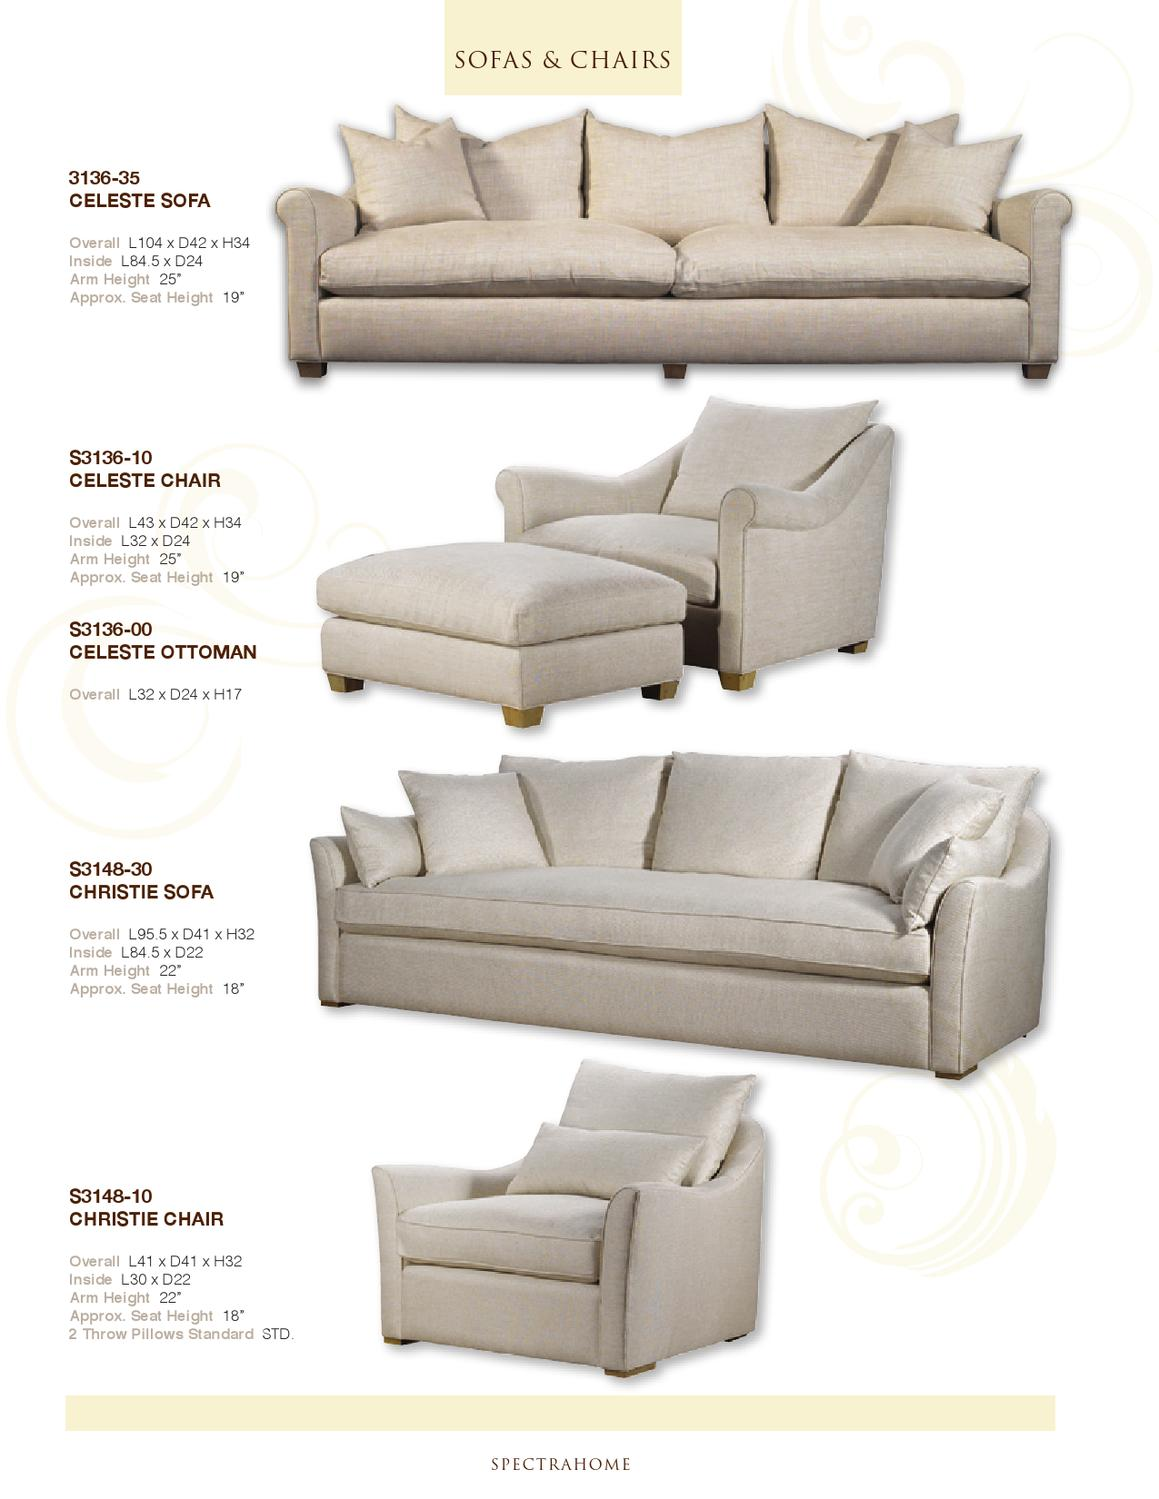 Sofa Seat Height Sofa Seat Heightfabulous Oliver Chaise Sofa Too Big Though Total